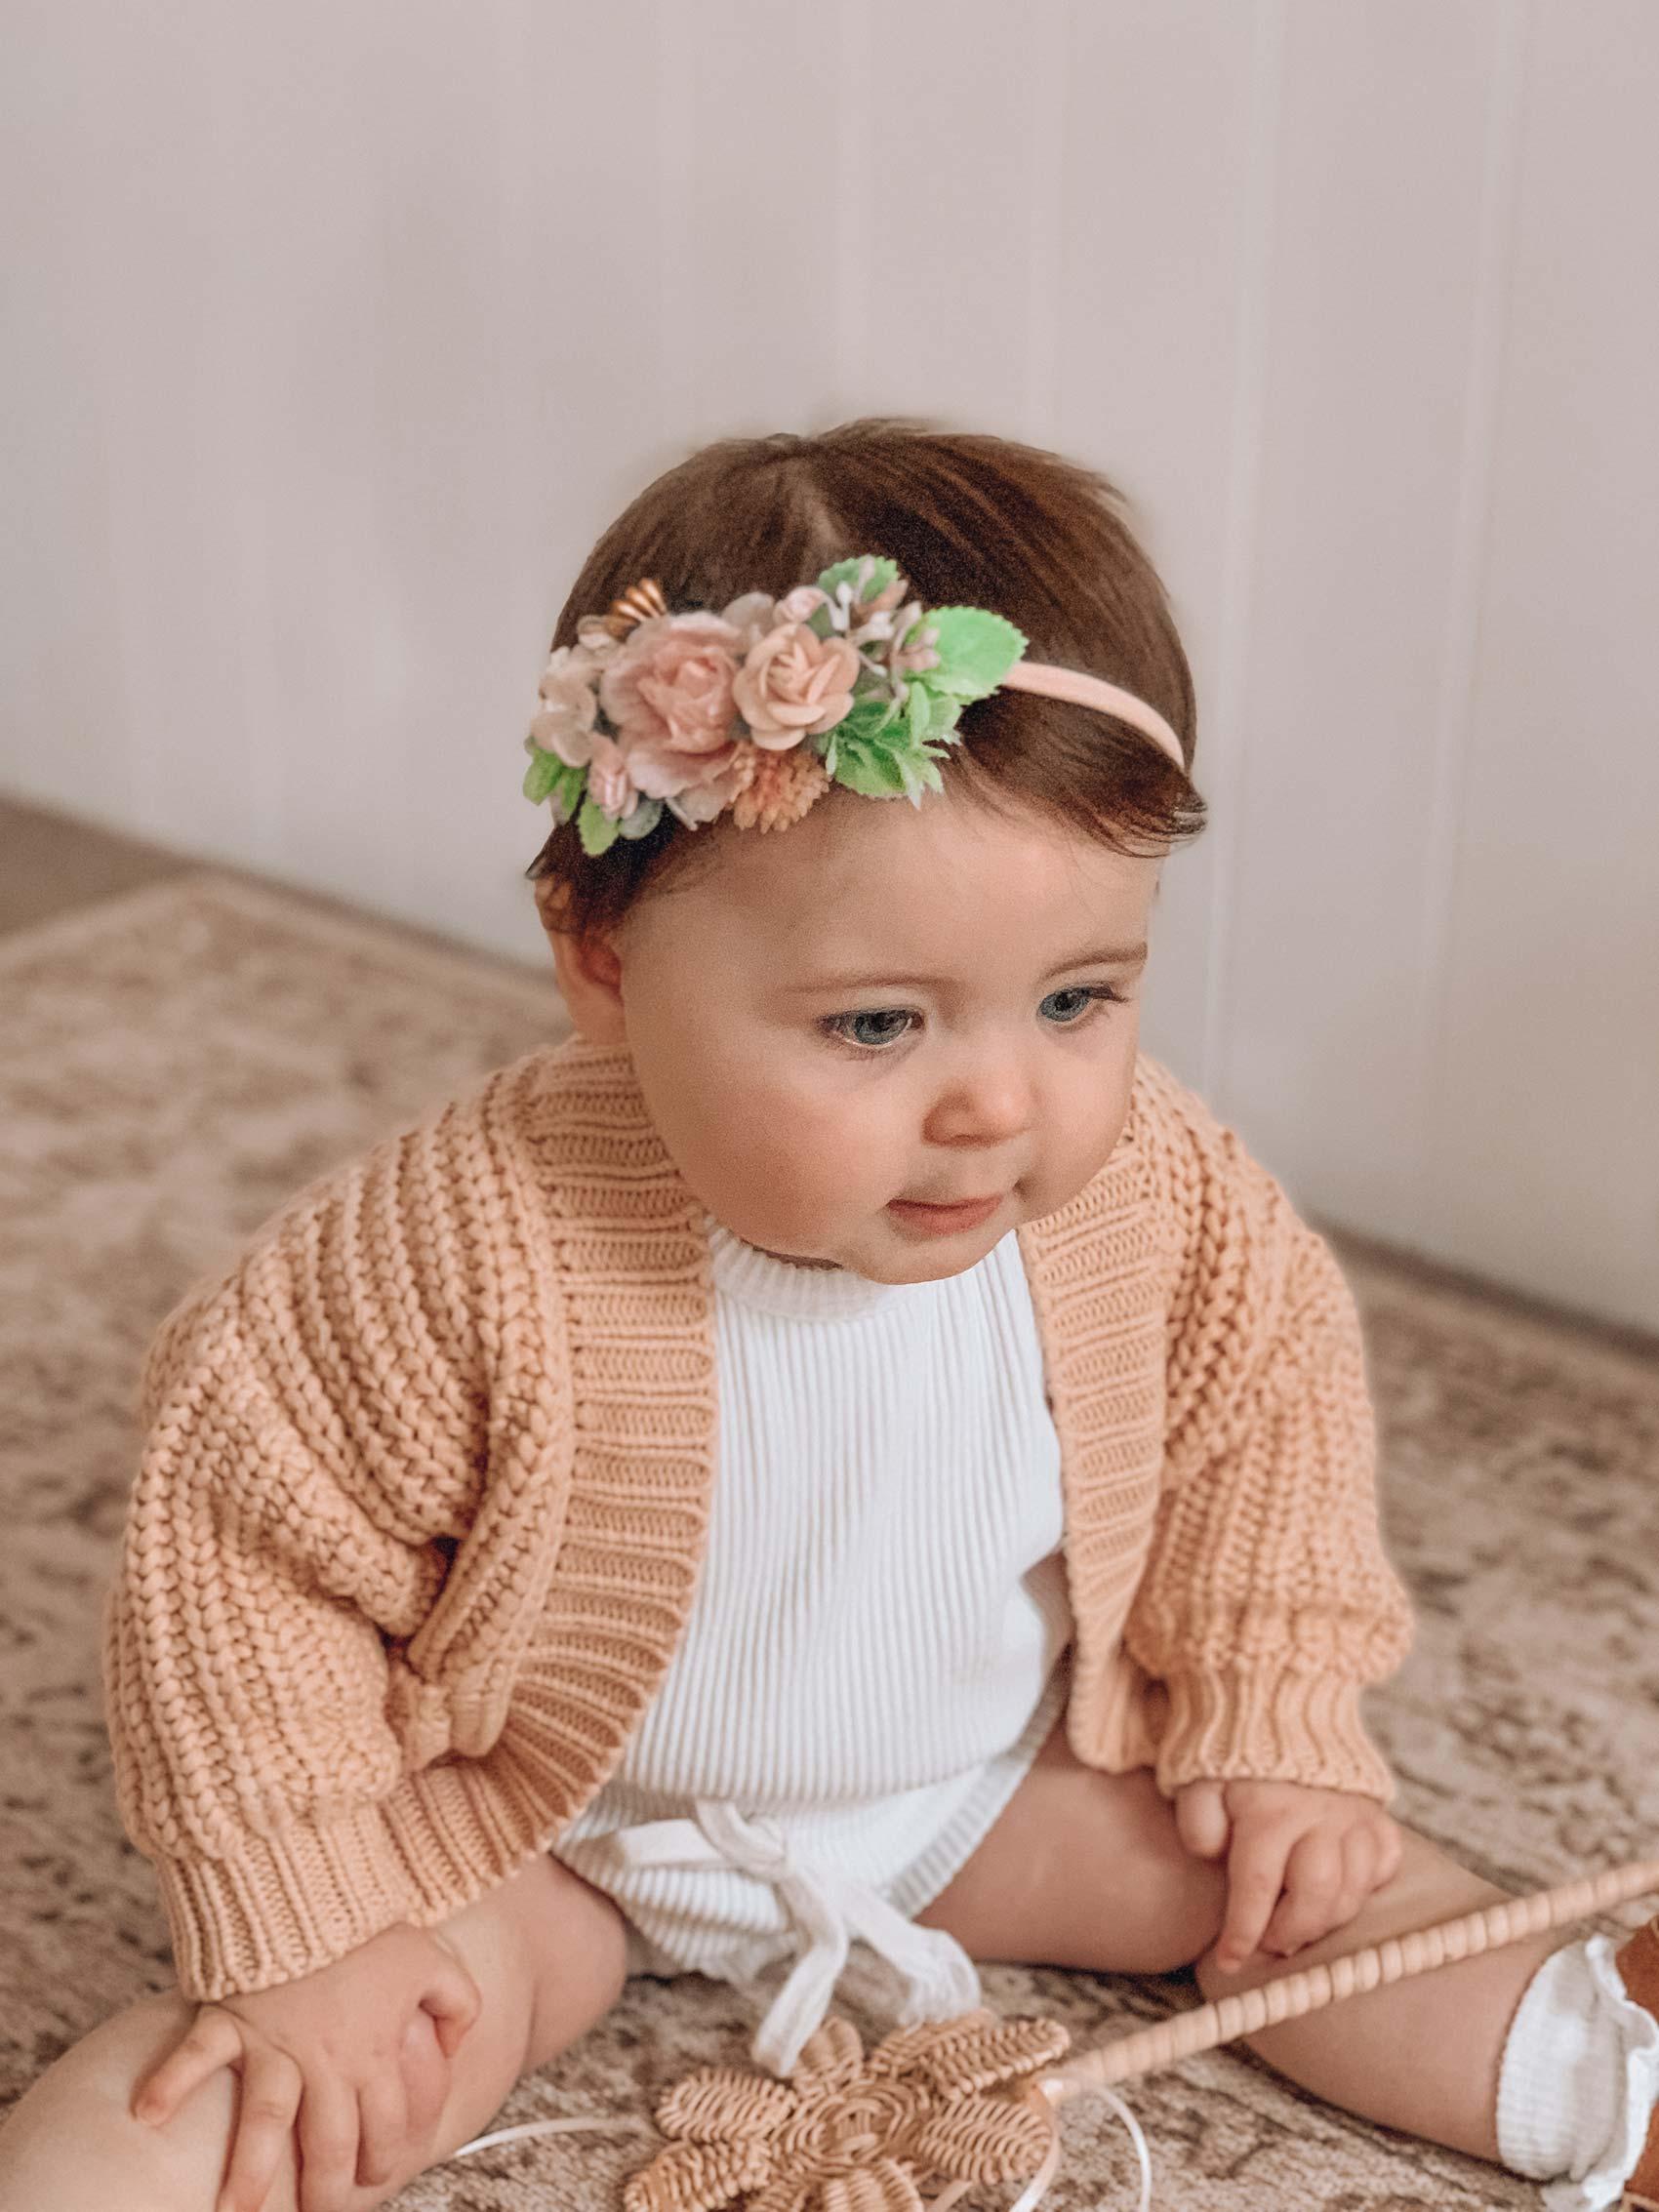 Caggie Knit Cardigan Oatmeal Cora Floral Stretch Headband